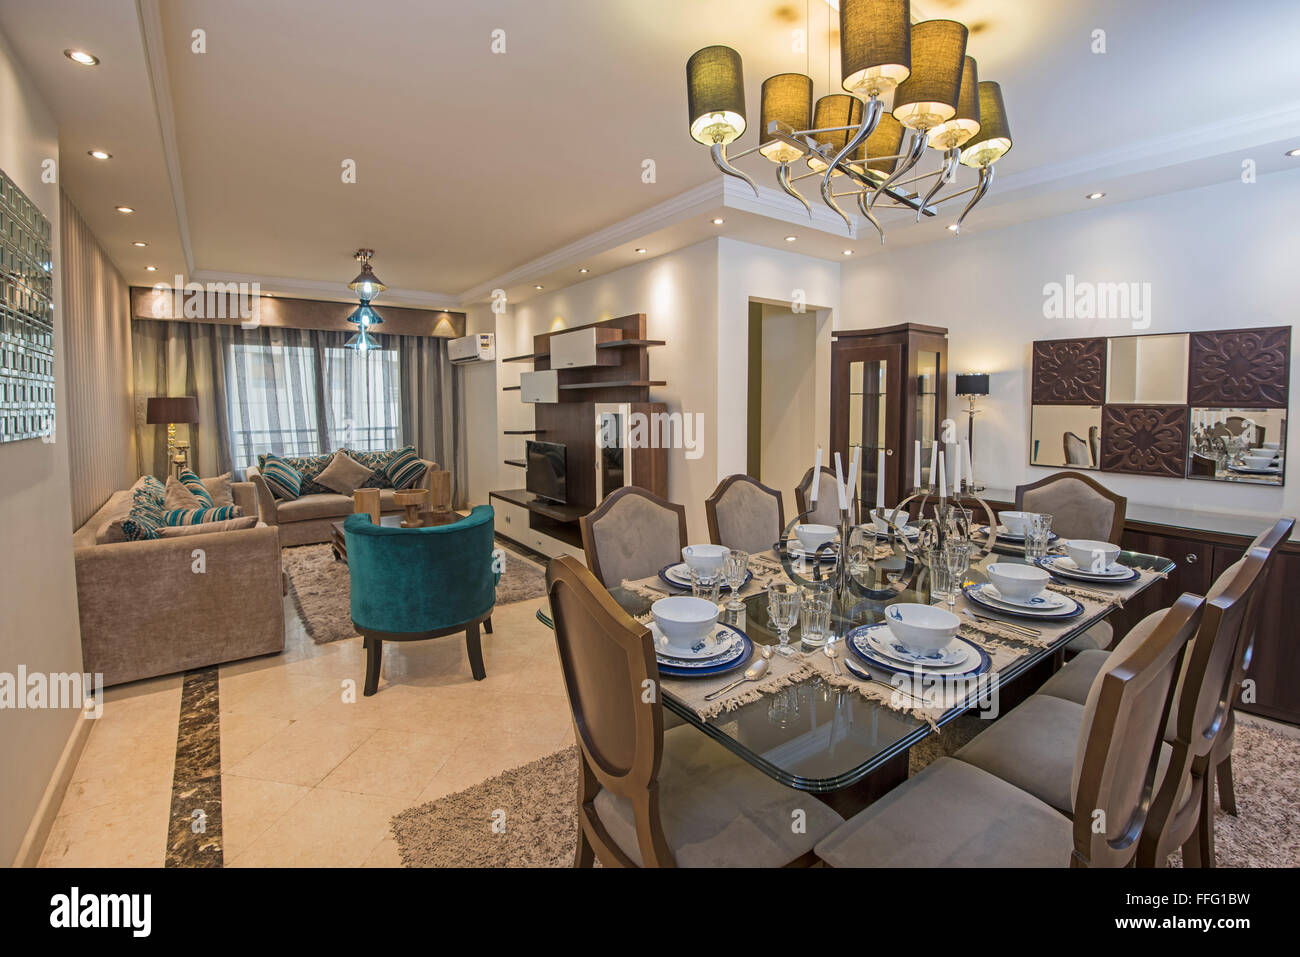 Interior Design Of A Luxury Apartment Show Home Living